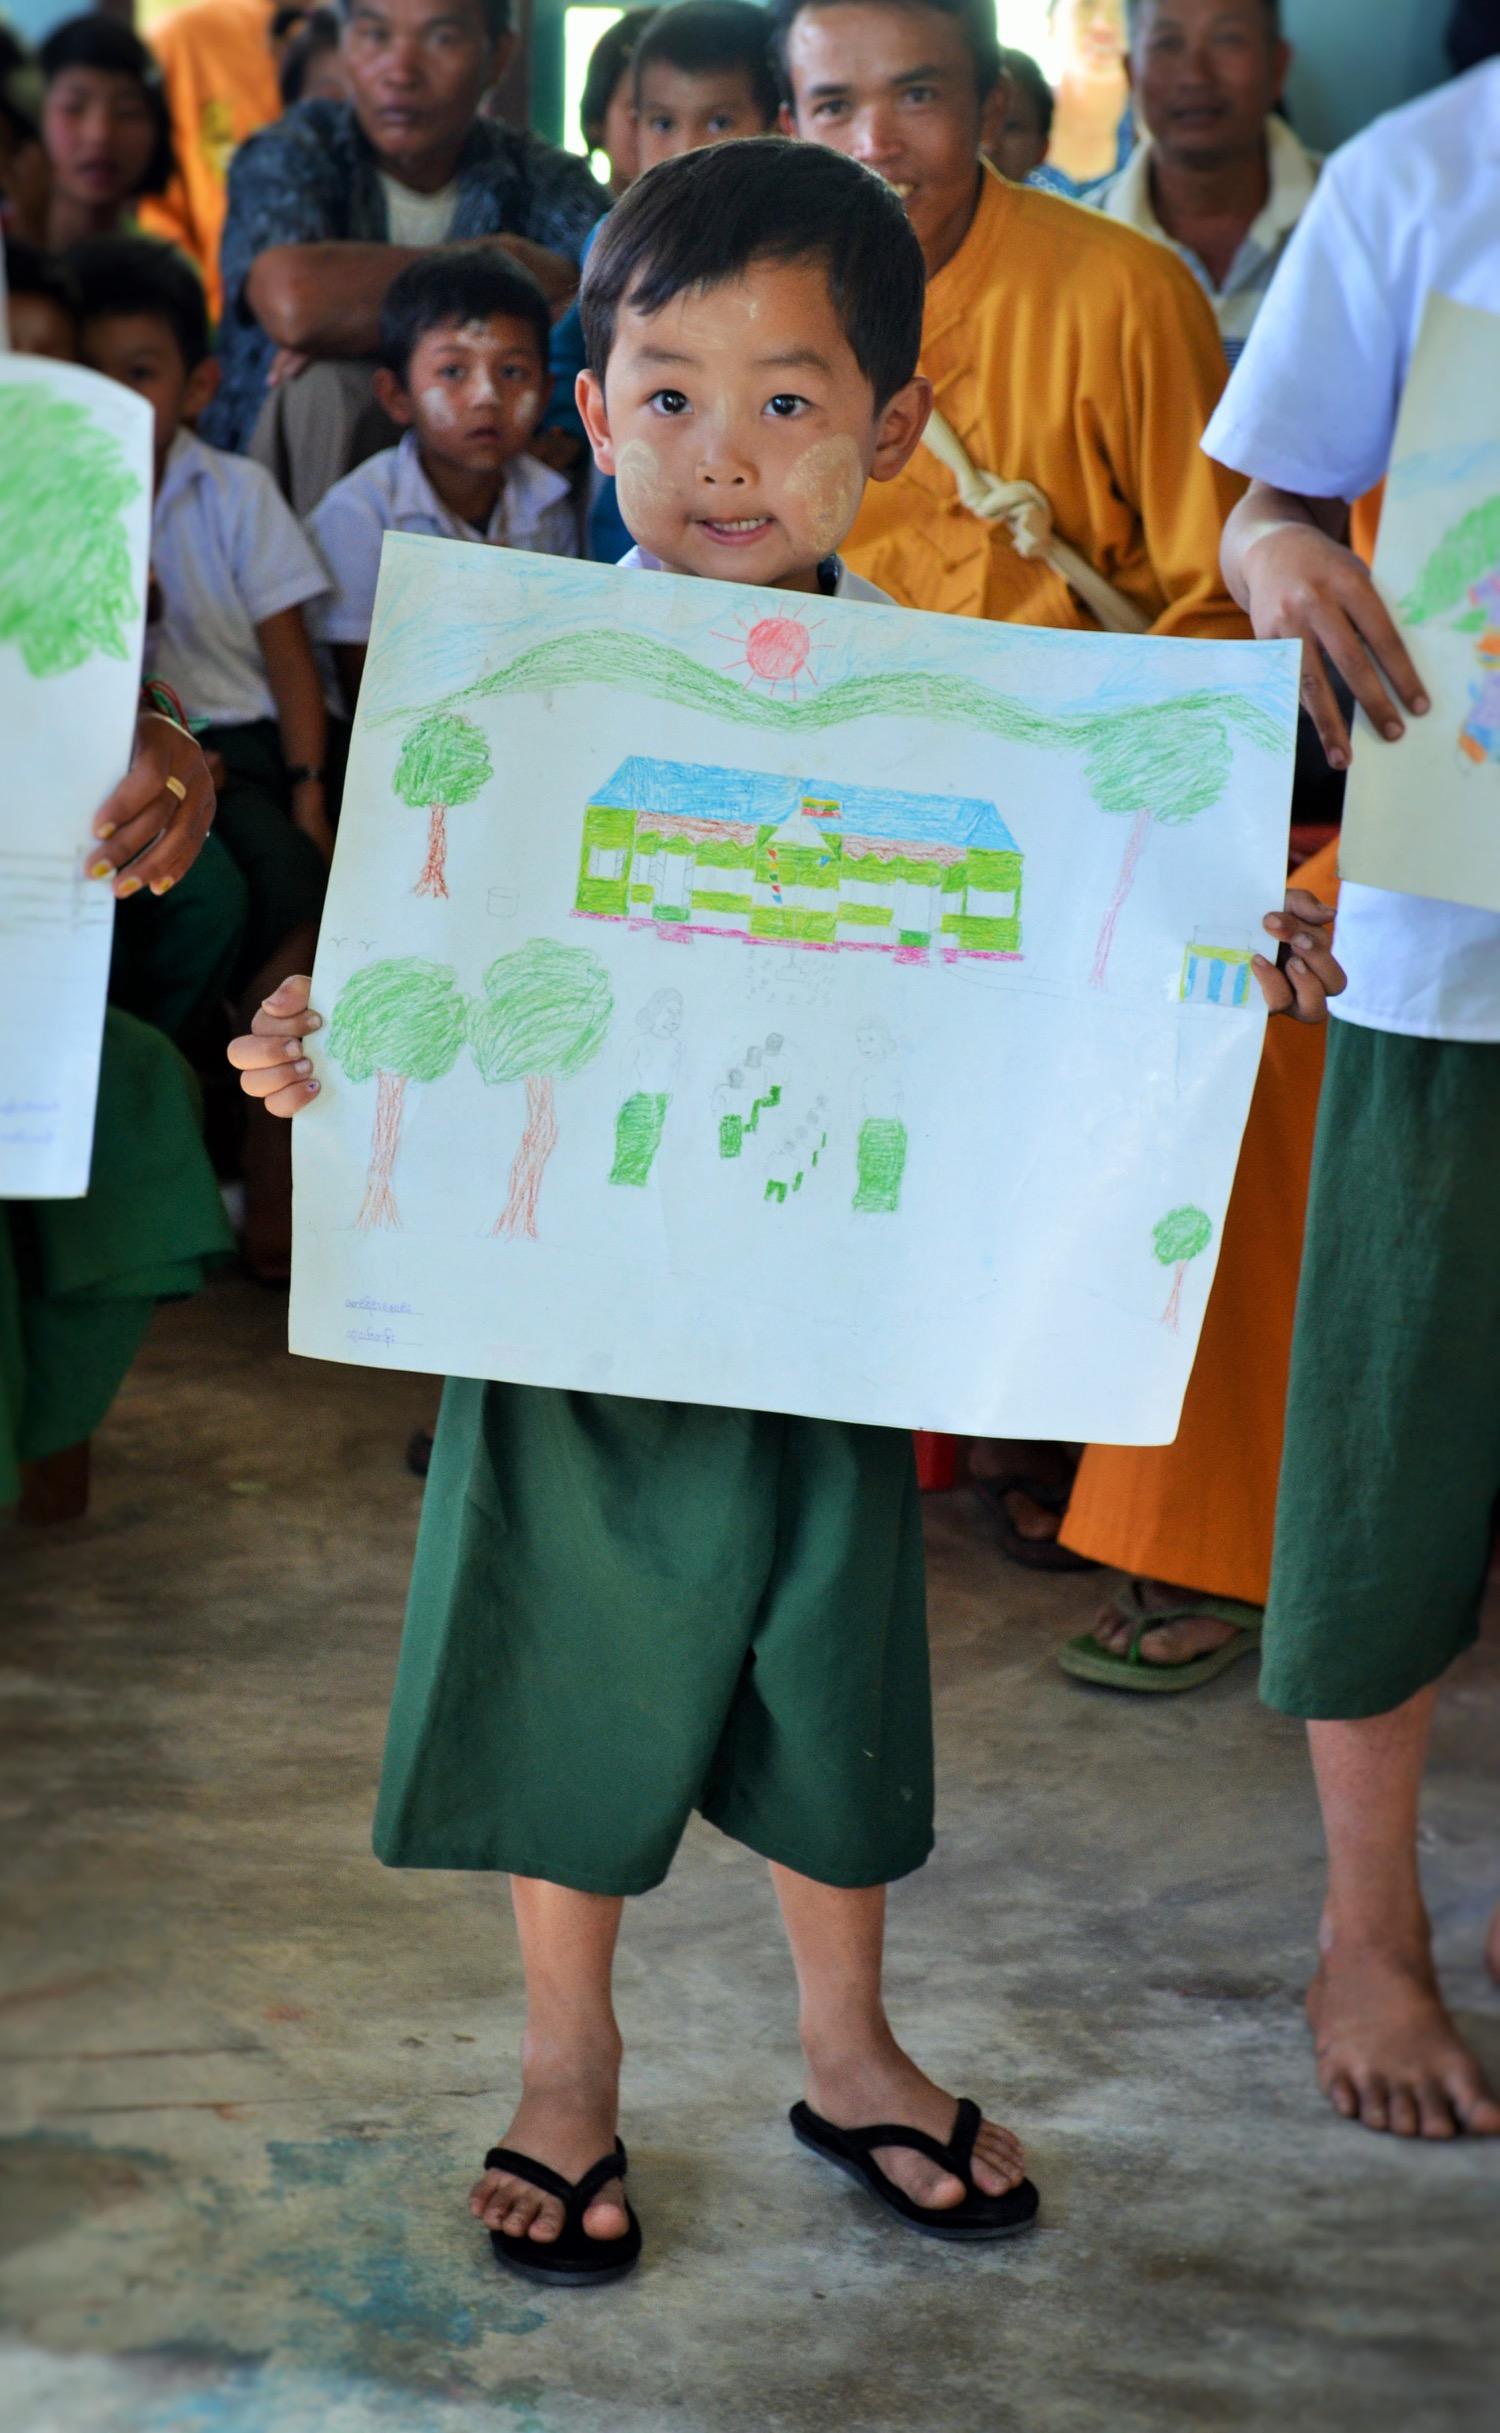 Sai Nay Lin, the artist himself!